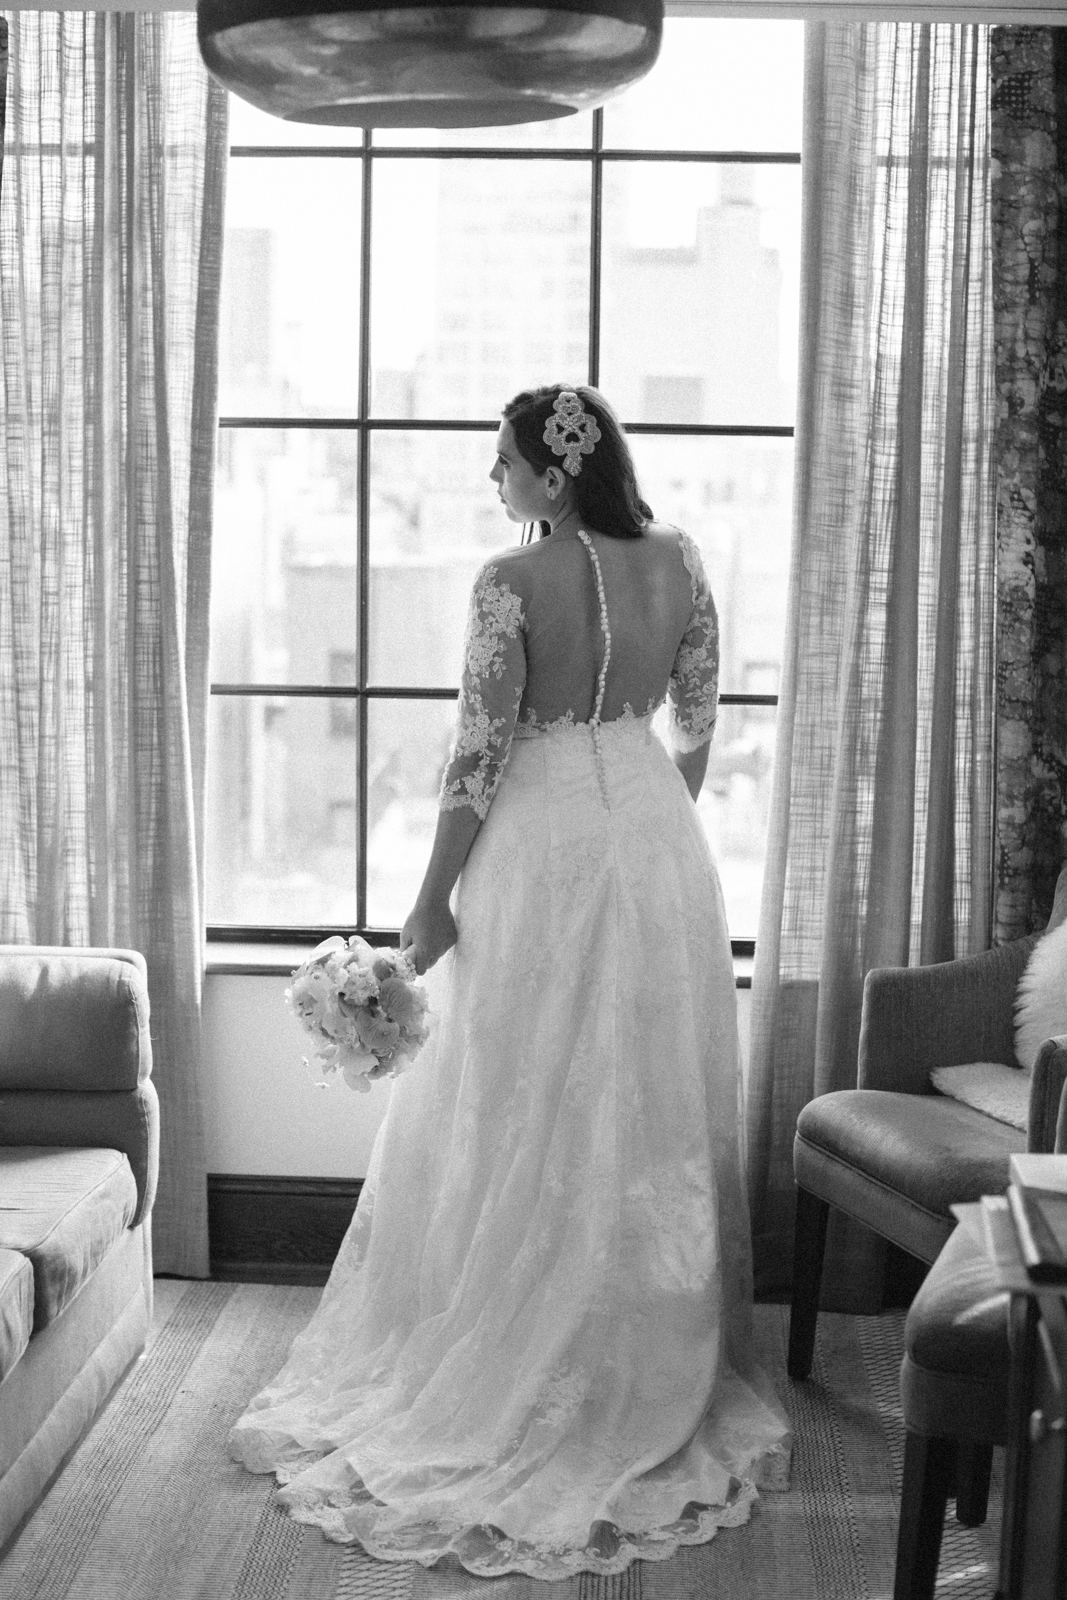 NYC Wedding Photography Lofts at Prince Brooklyn NYC Photographer Boris Zaretsky _B2C5275.jpg